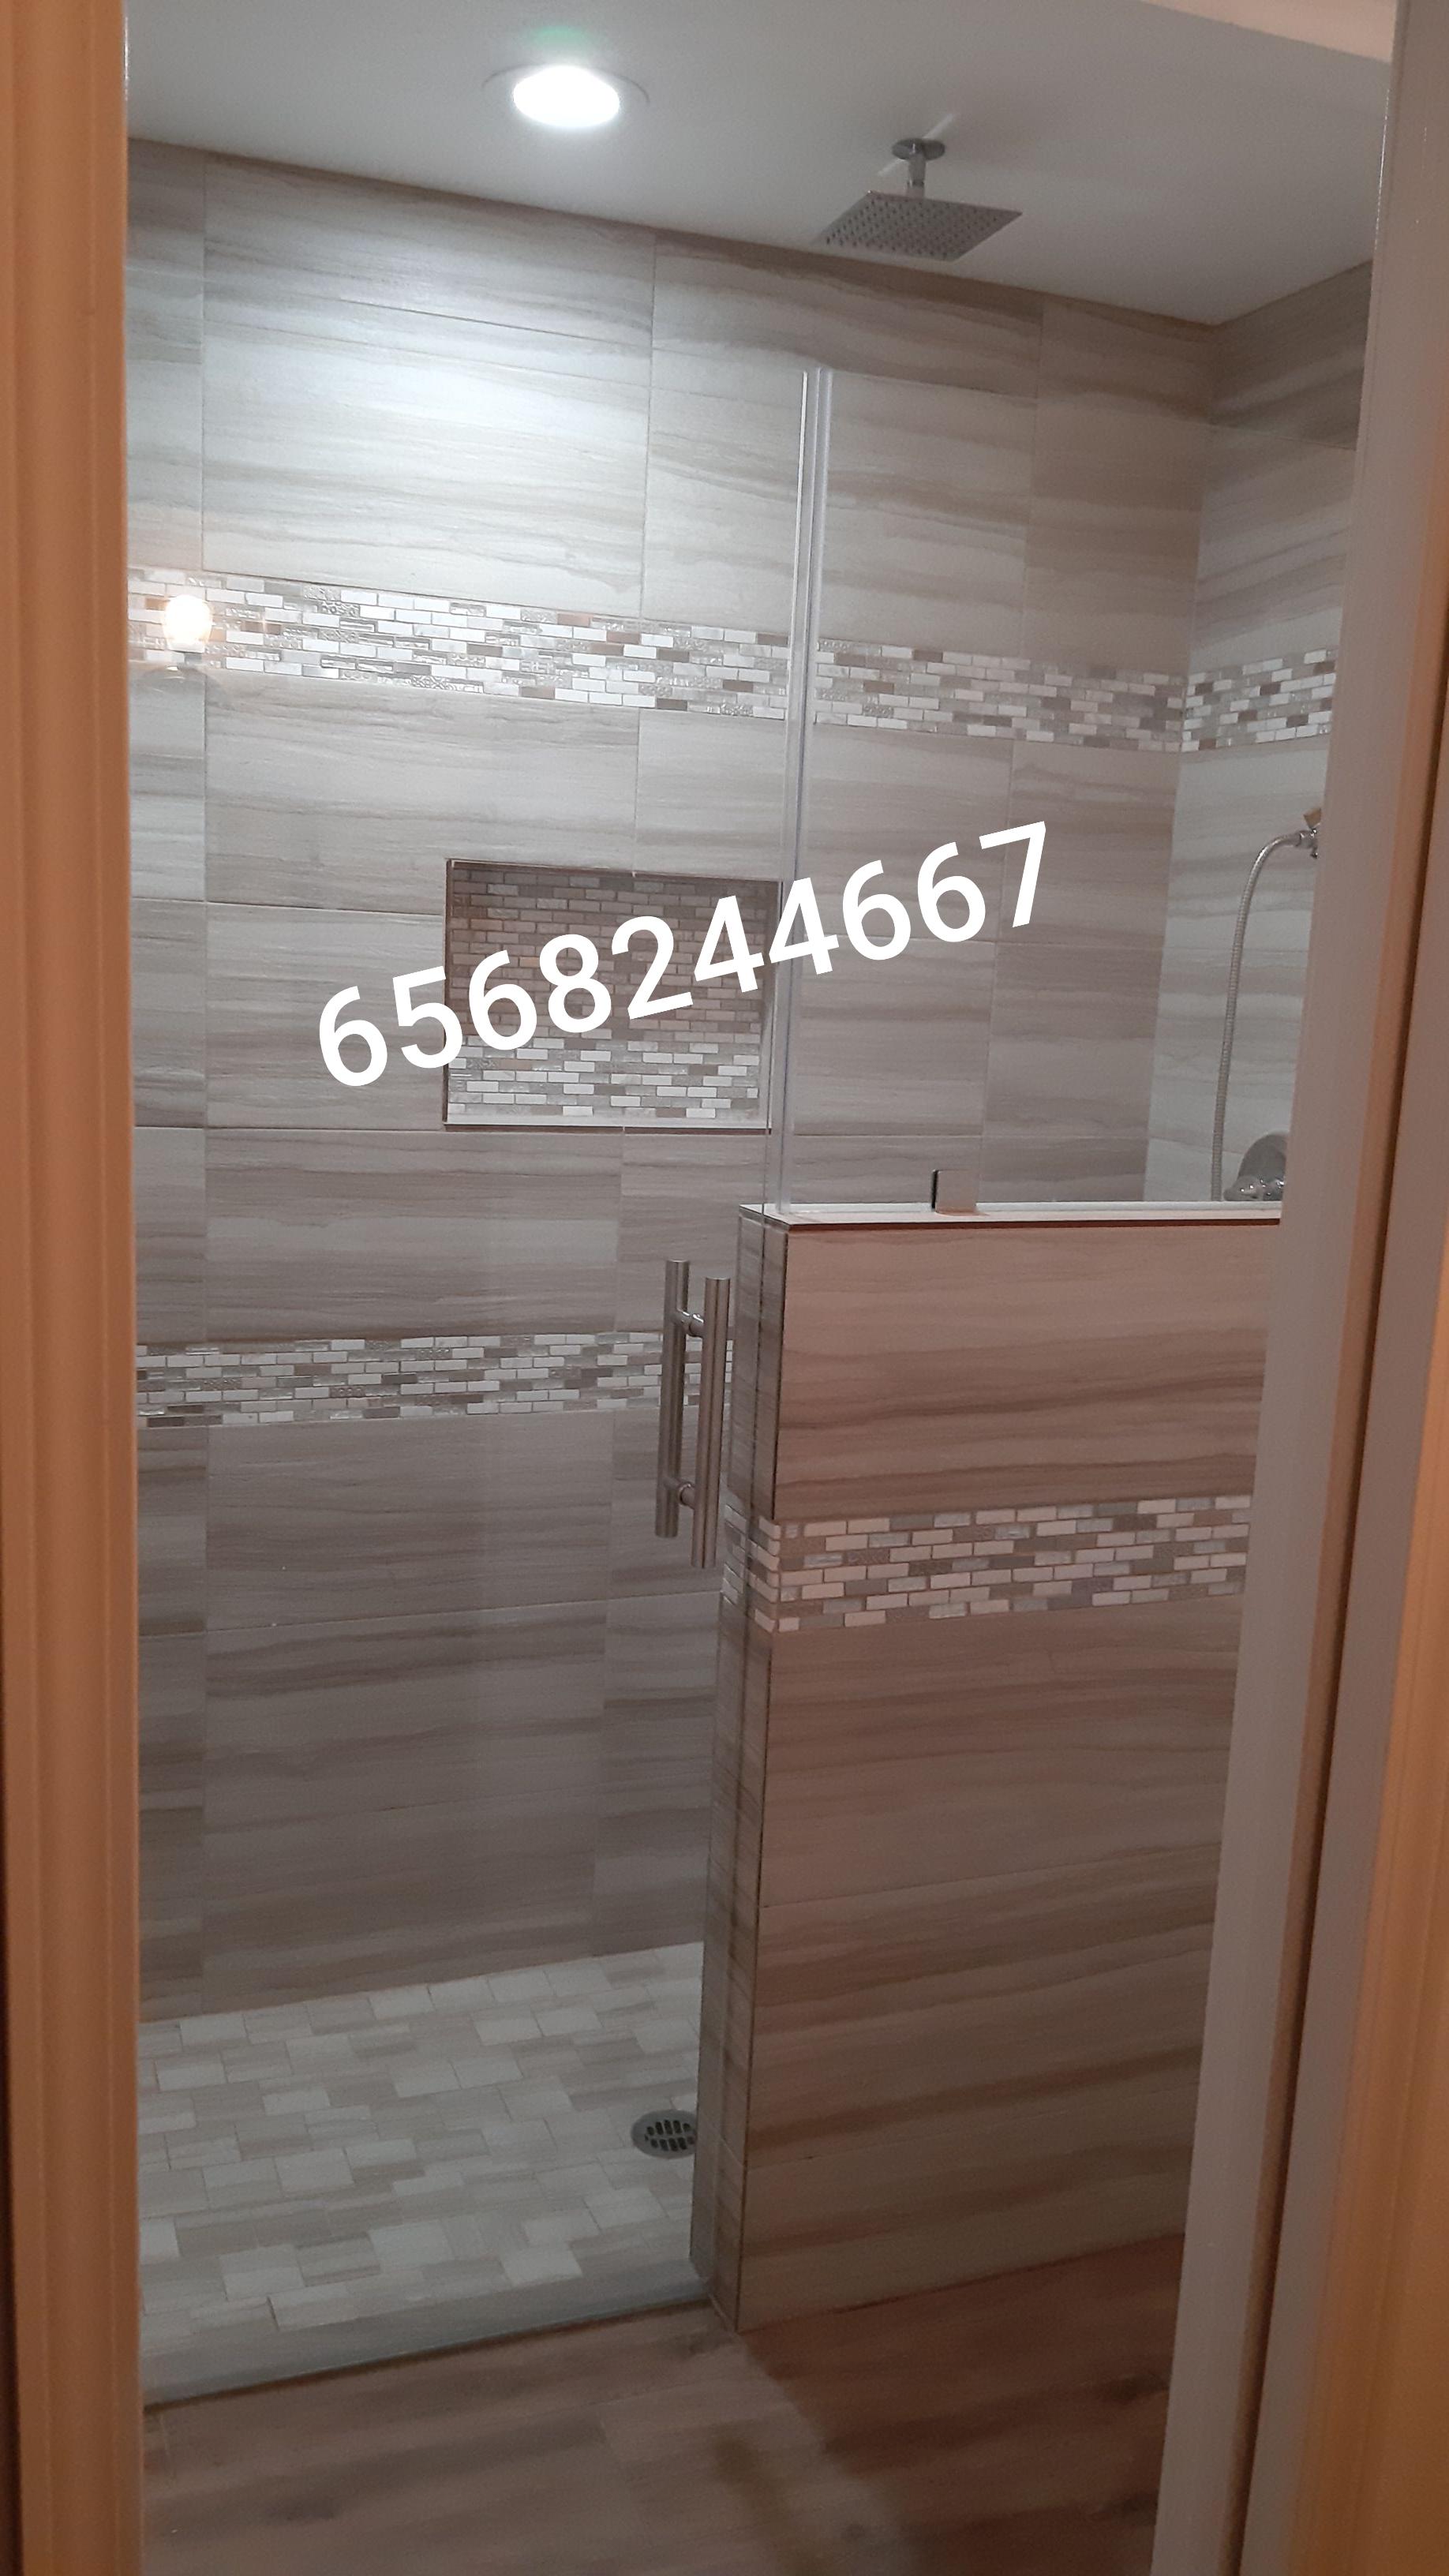 20200421_143756